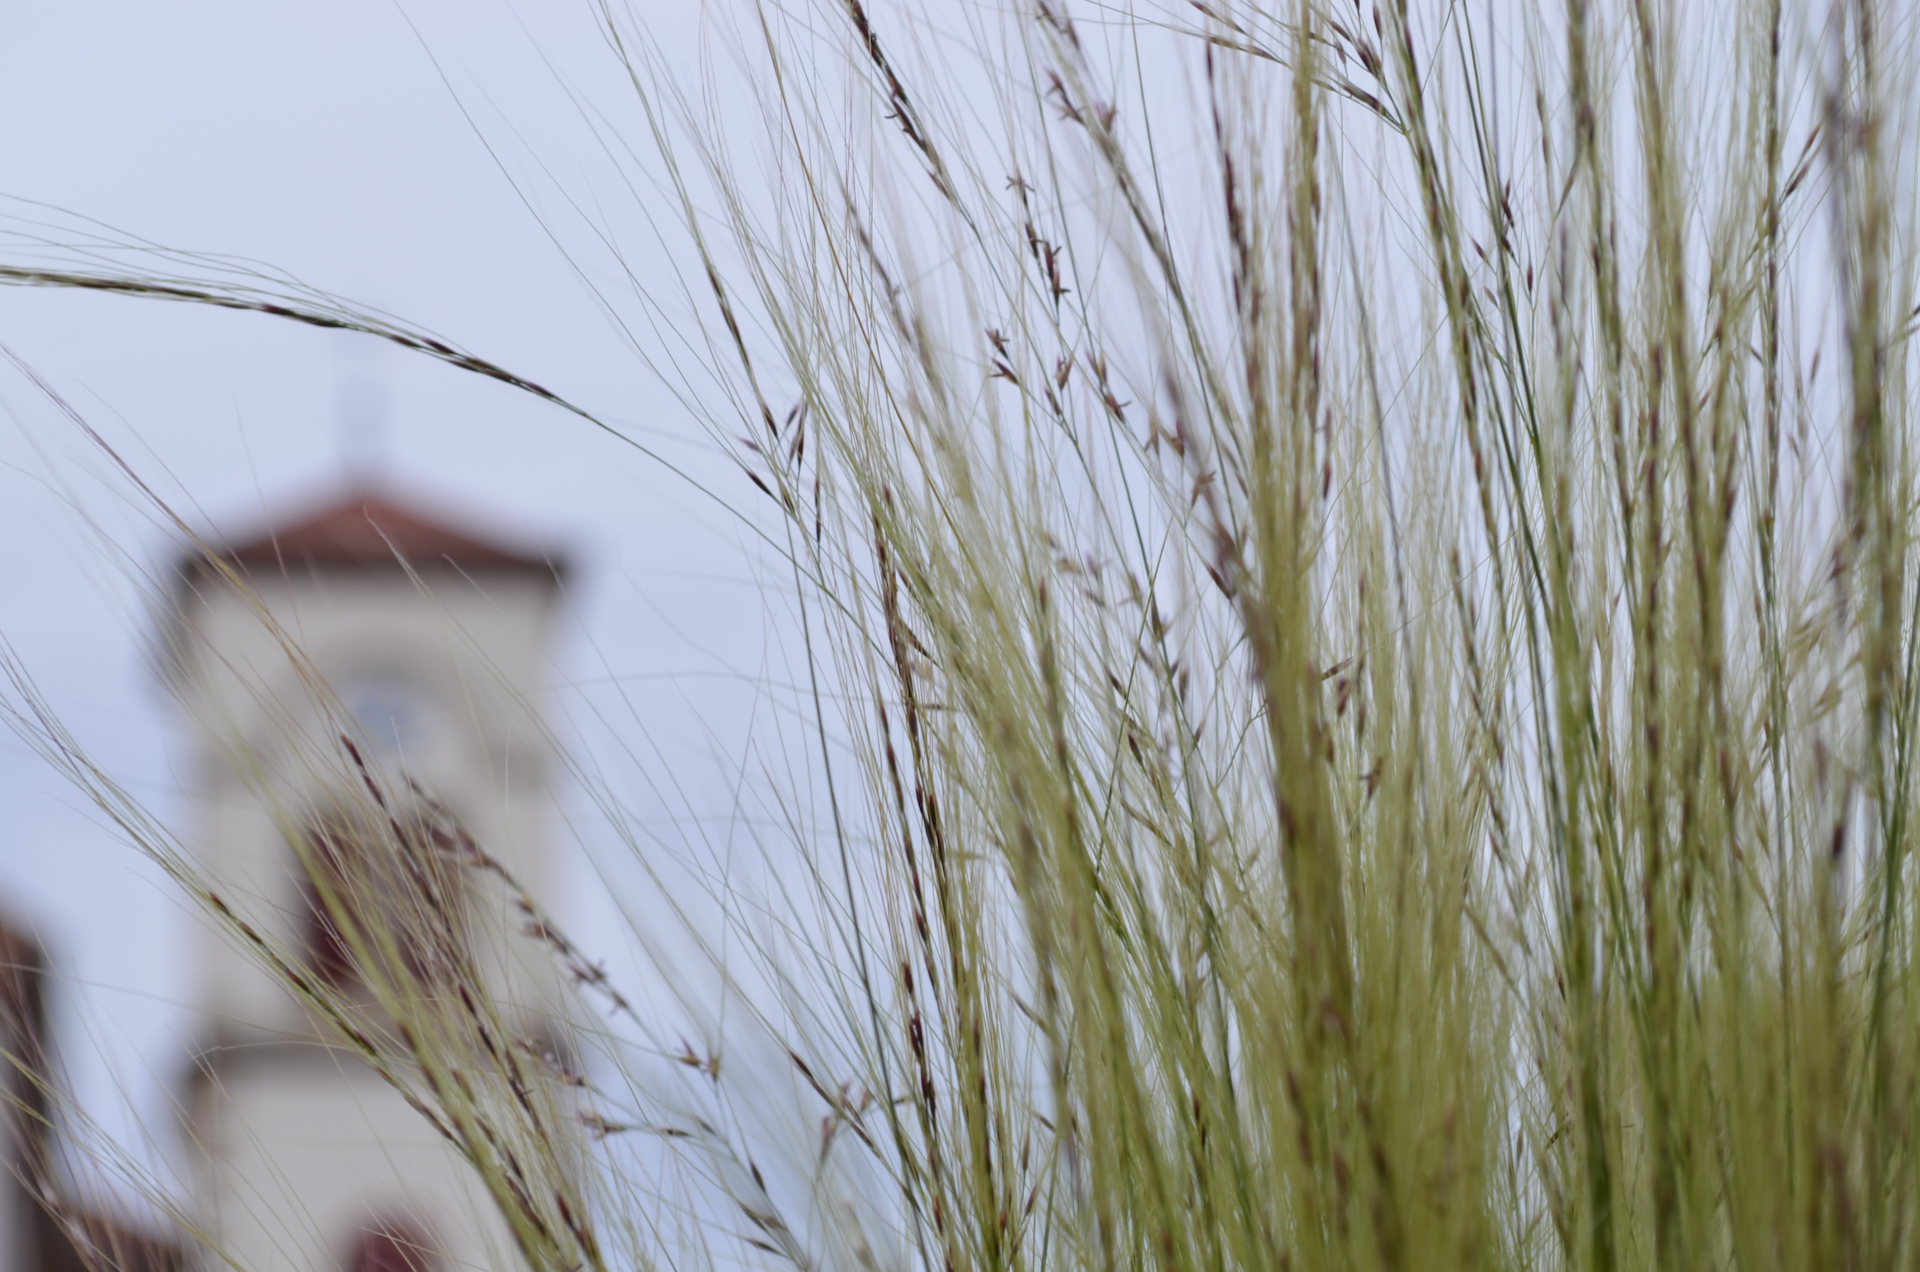 Photo flou herbes eglise.jpeg